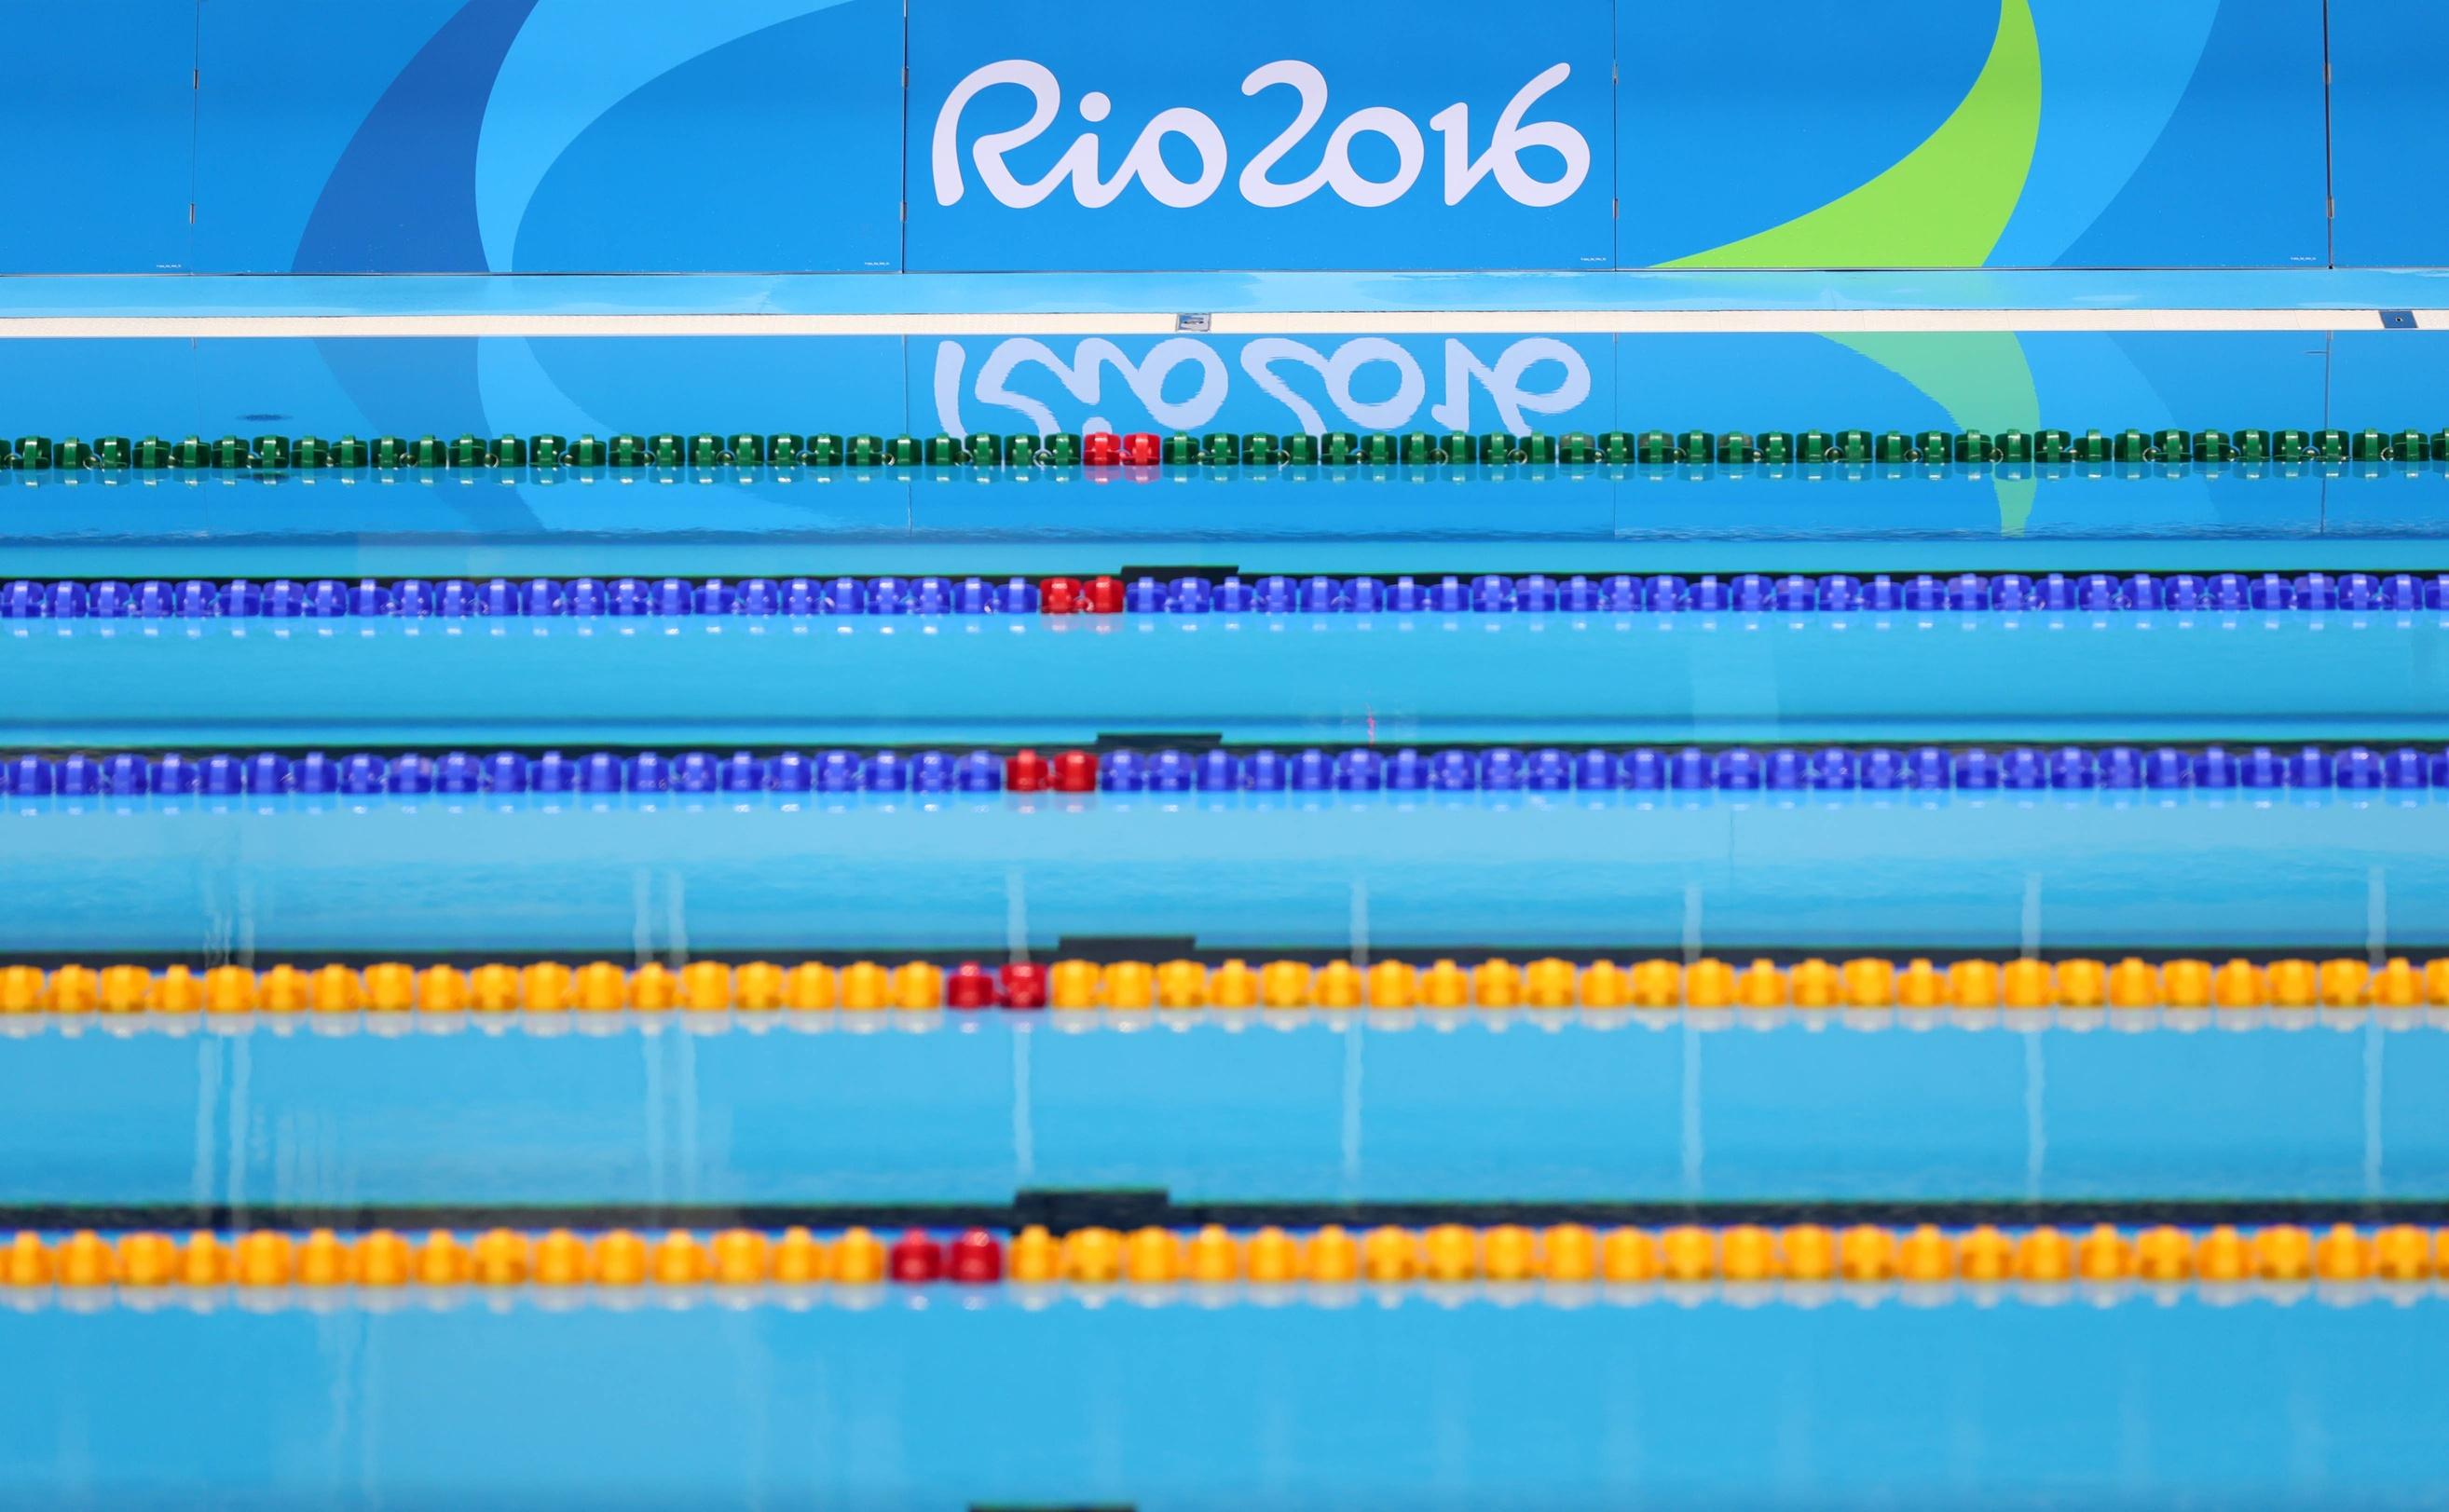 2016 Rio Olympic Games Day 1 Prelims Live Recap